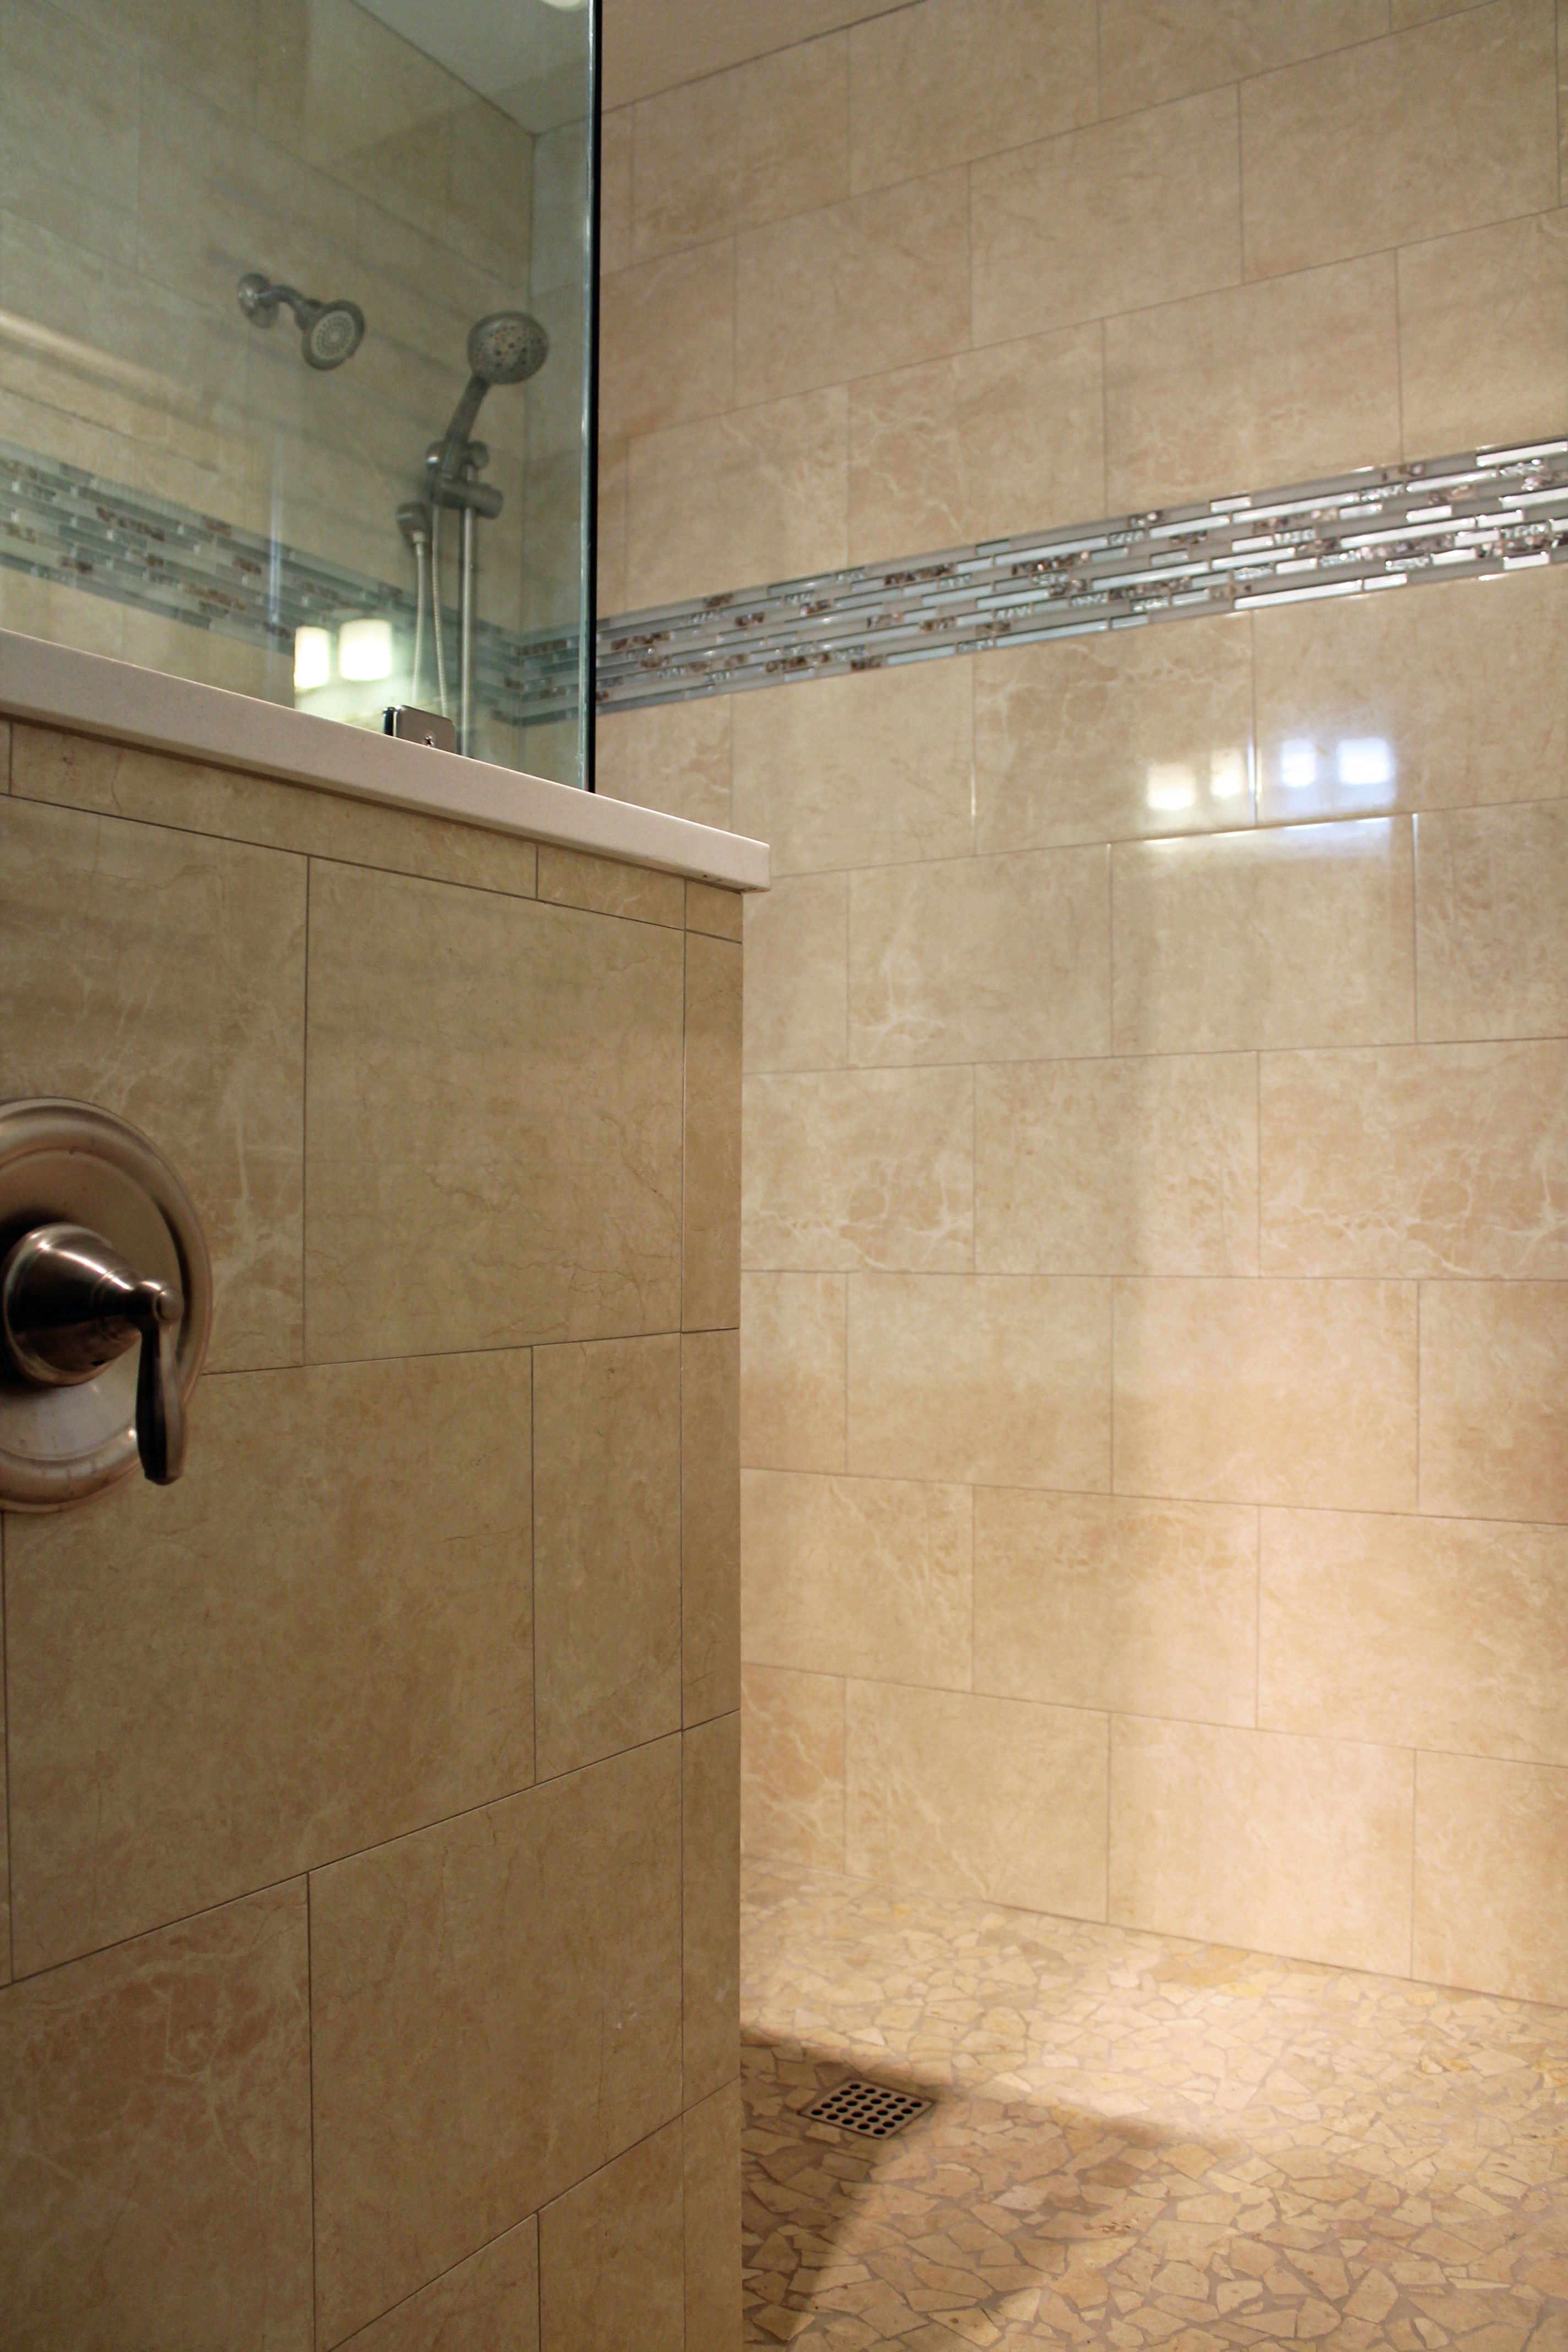 Large tile shower design travertine look wall tile blue glass large tile shower design travertine look wall tile blue glass mosaics ideas dailygadgetfo Images